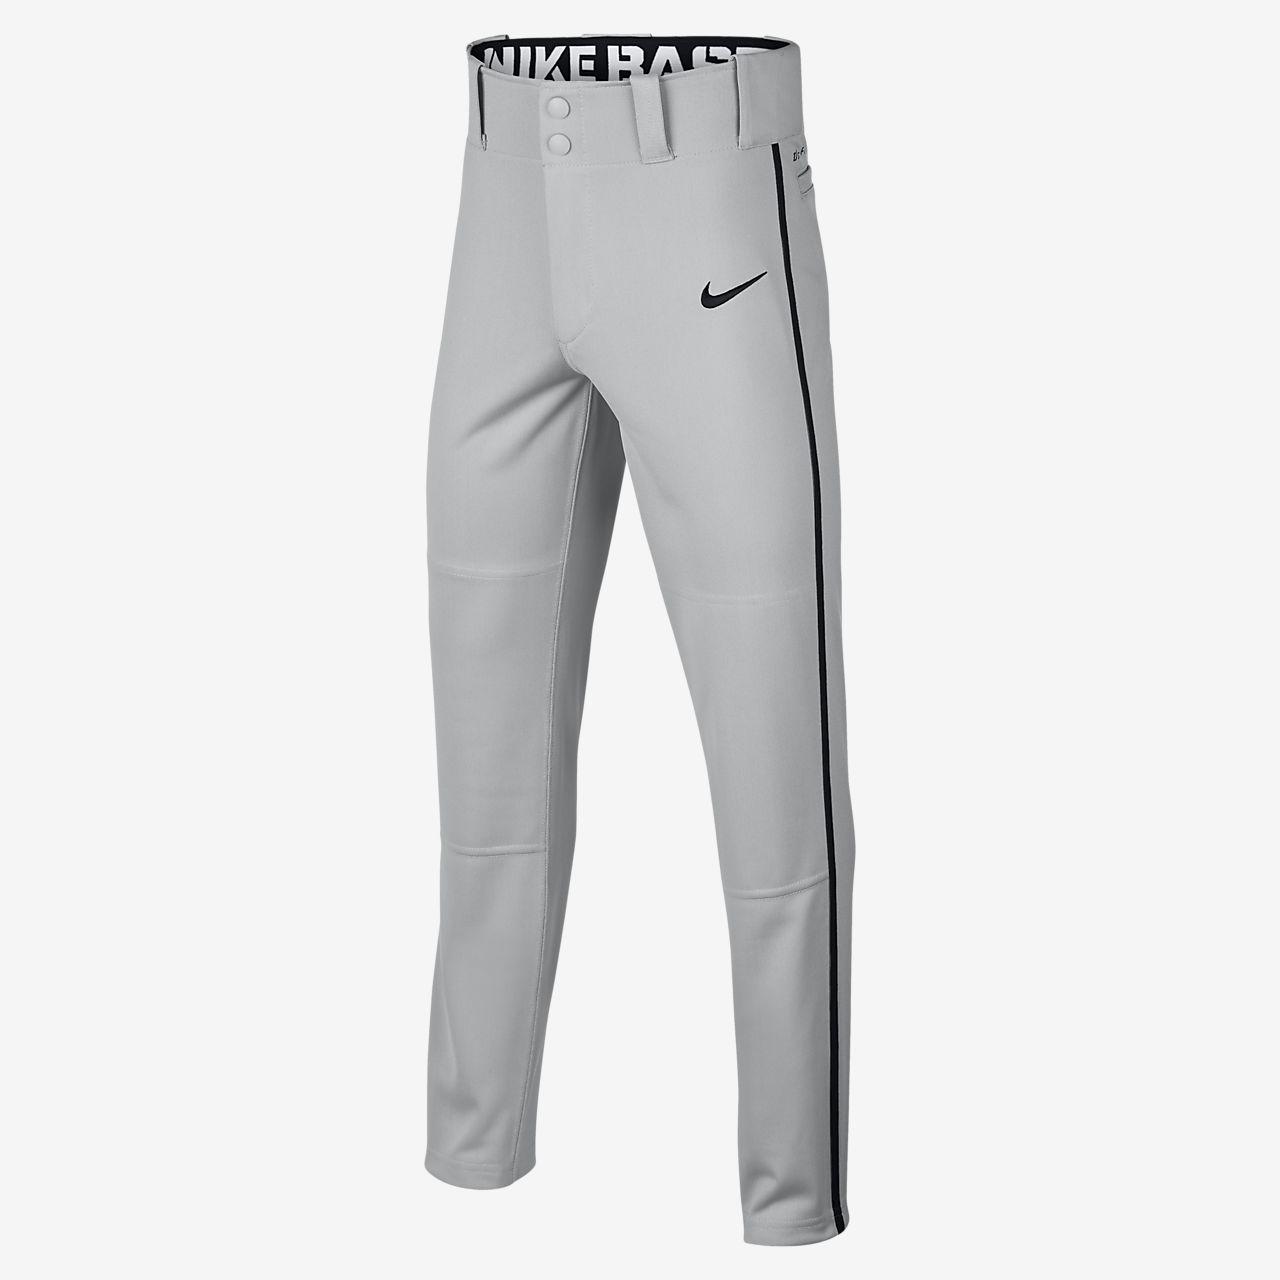 dea4d0da8 Nike Swoosh Big Kids' (Boys') Baseball Pants. Nike.com